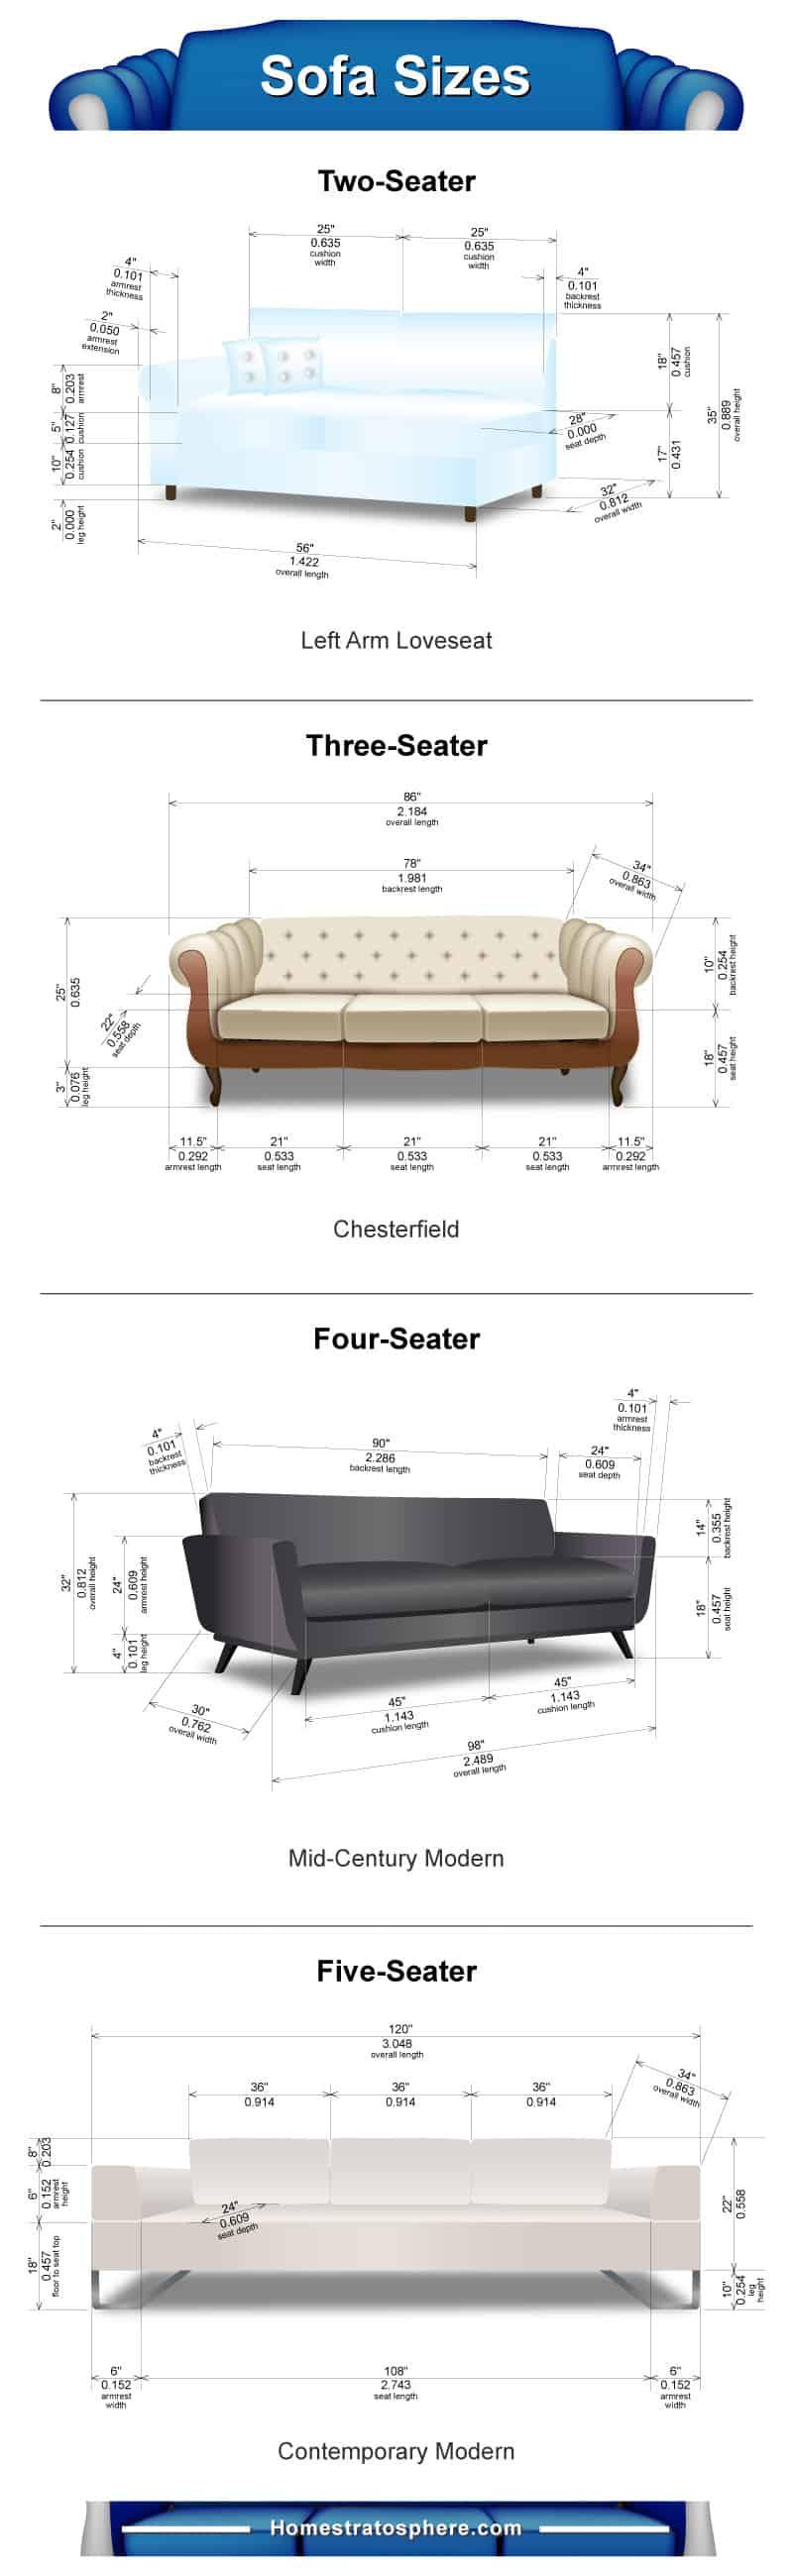 Sofa dimensions infographic